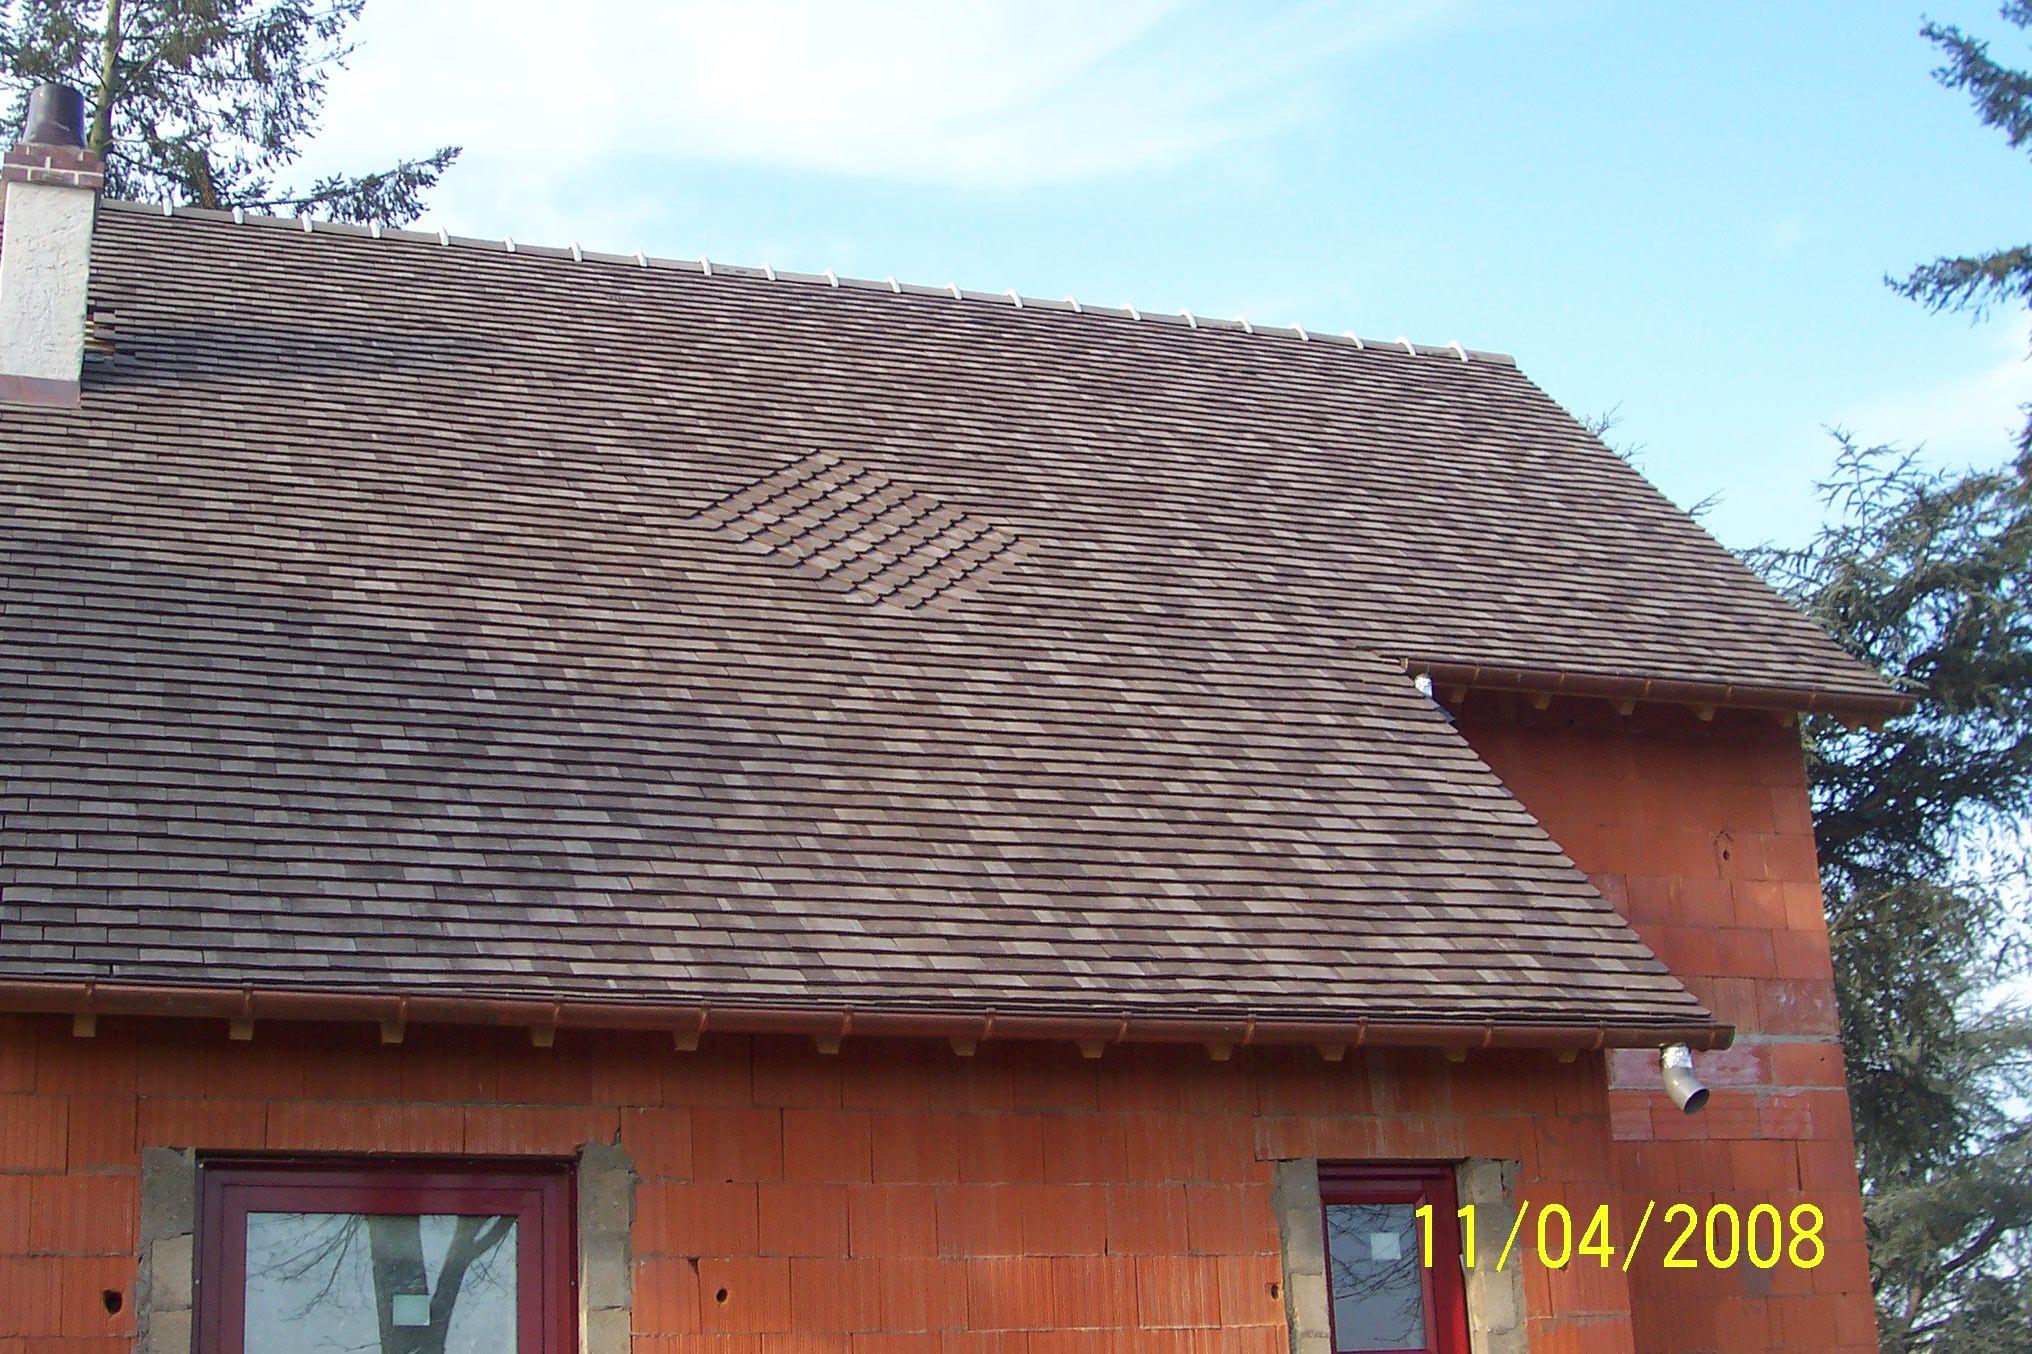 toiture tuile plate affordable toitures domaine specialiste couverture dijon cote d or. Black Bedroom Furniture Sets. Home Design Ideas